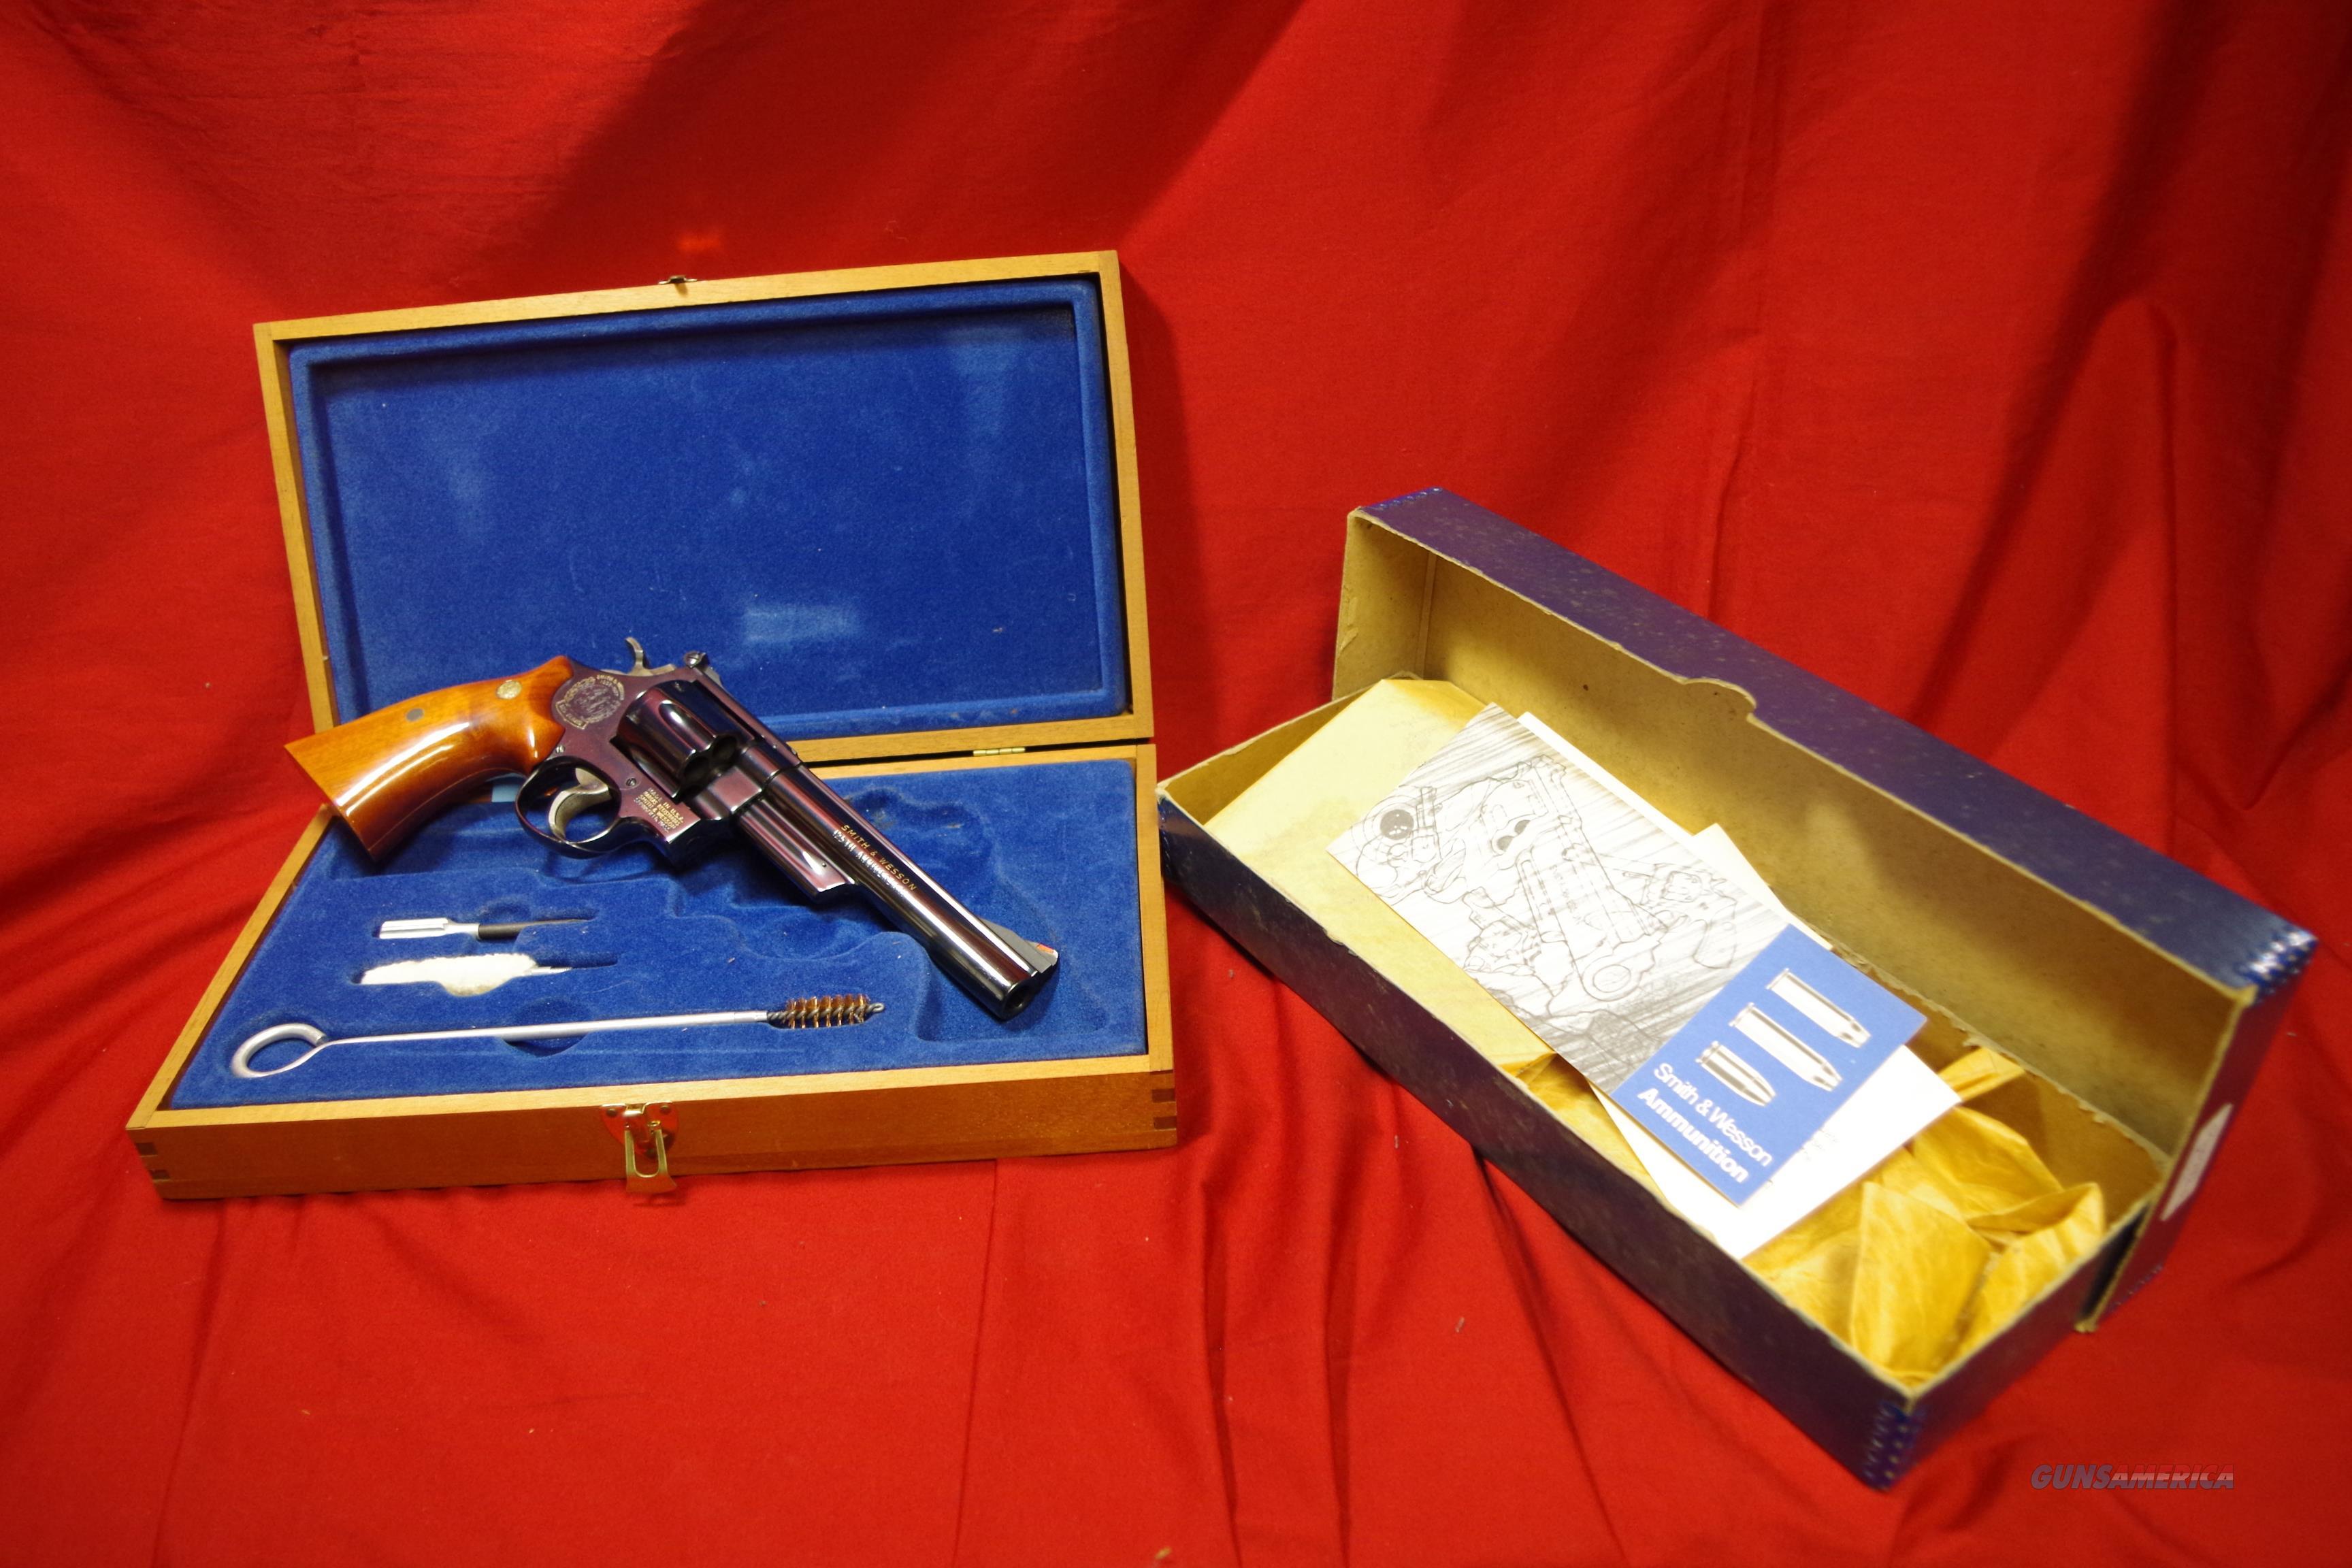 Smith & Wesson 25-3 Anniversary Edition w/presentation case  Guns > Pistols > Smith & Wesson Revolvers > Full Frame Revolver